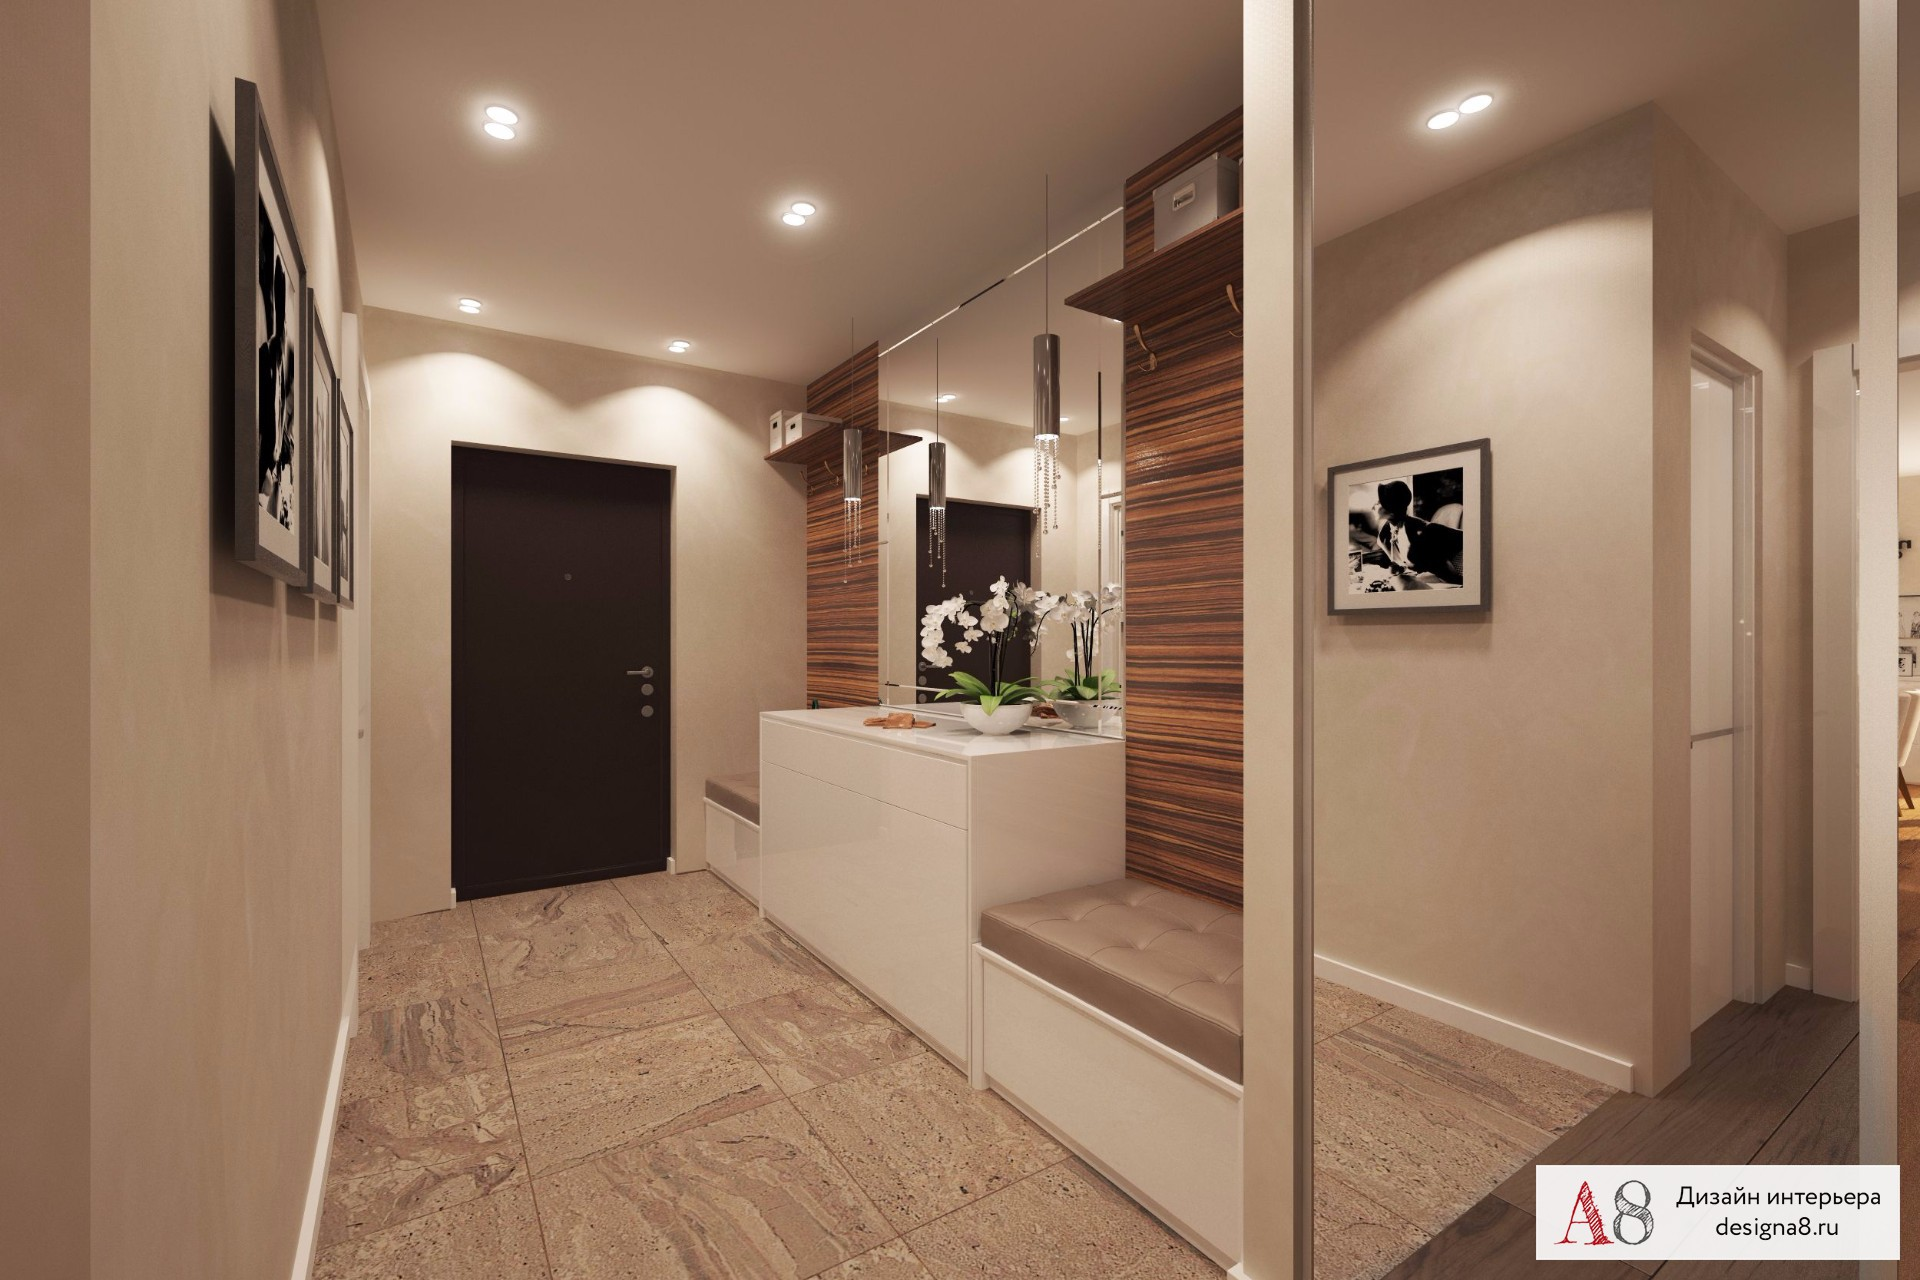 Дизайн и интерьер фото трёхкомнатных квартир 64 кв.м